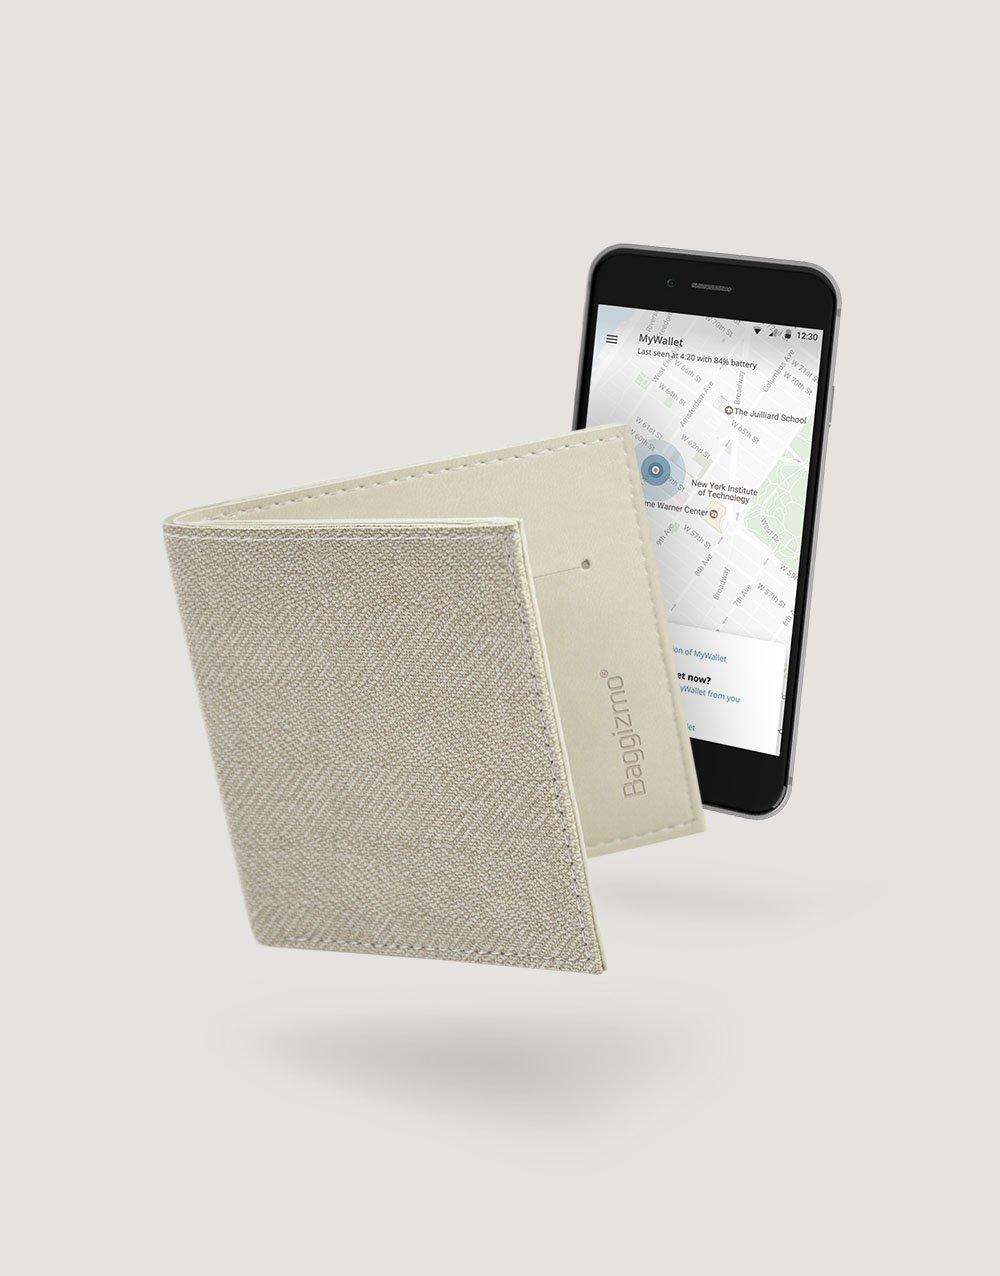 Baggizmo Wiseward smart wallet in sandy beige color connected to Baggizmo app